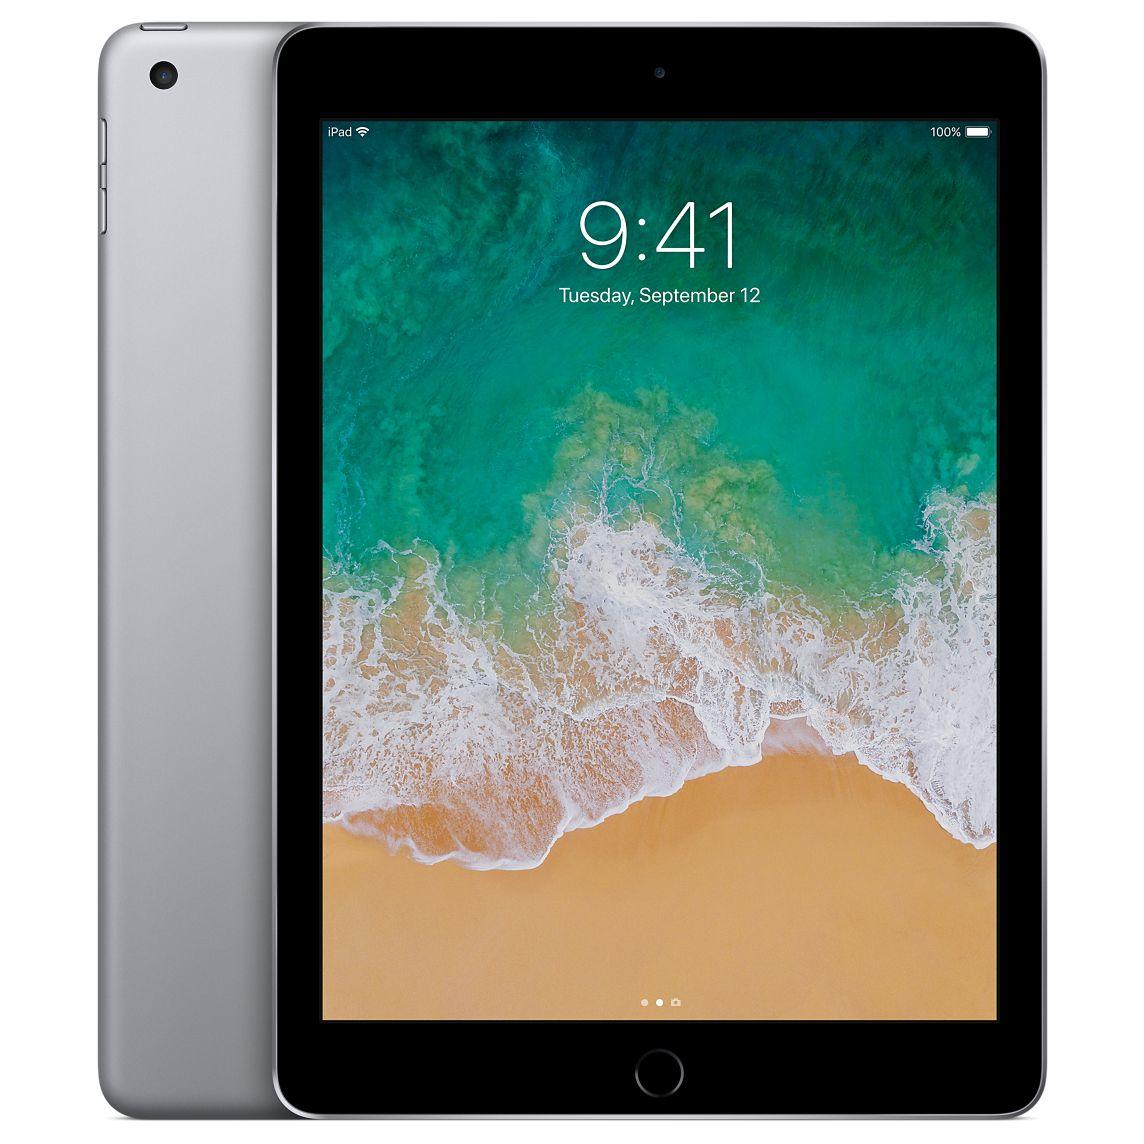 iPad (2017) erstmals im Apple Refurb Store